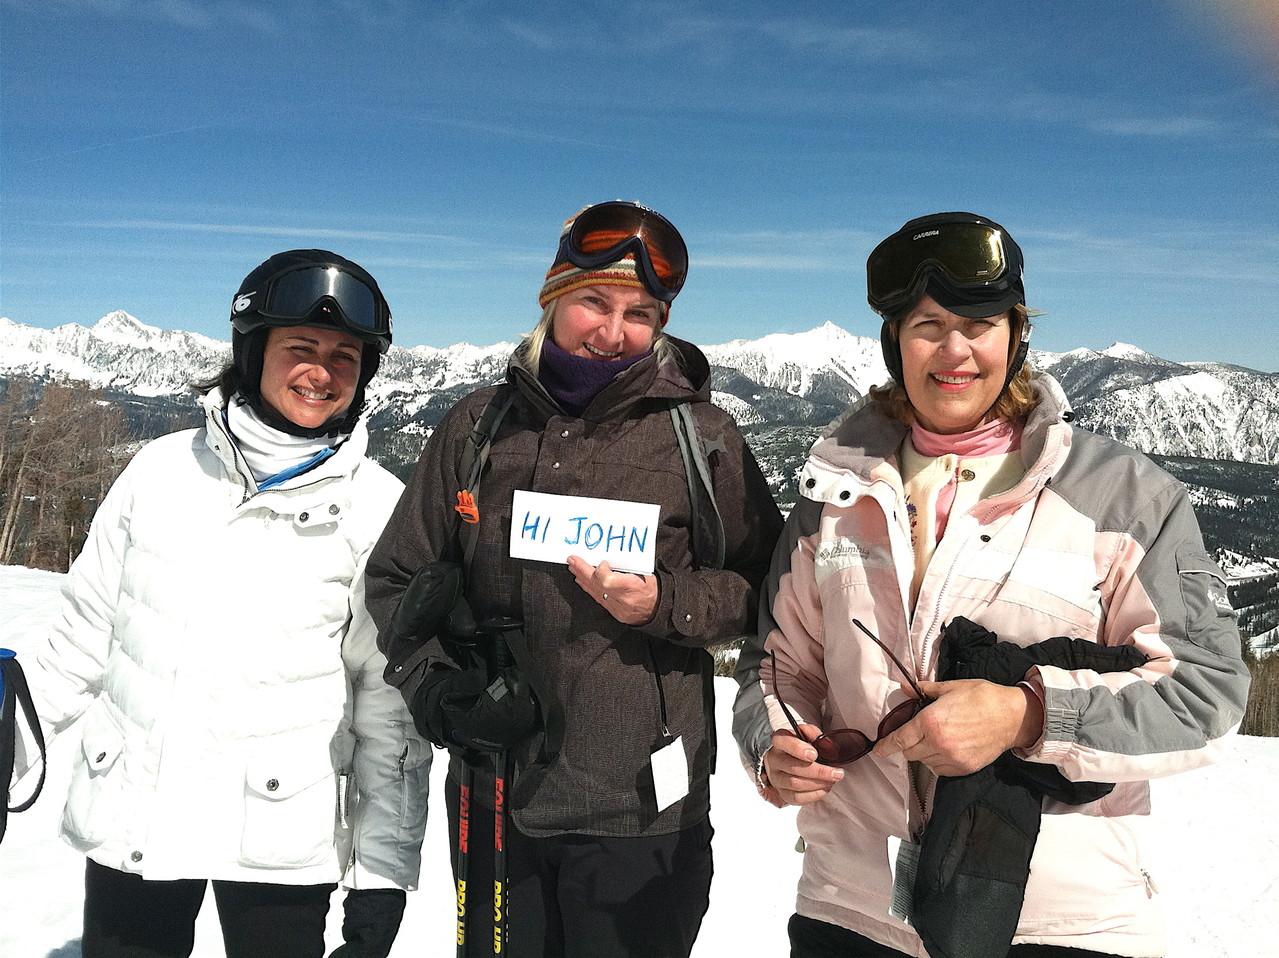 Allie, John's cousin Kathy Schmidt, & Lorraine Gudas Big Sky 2013